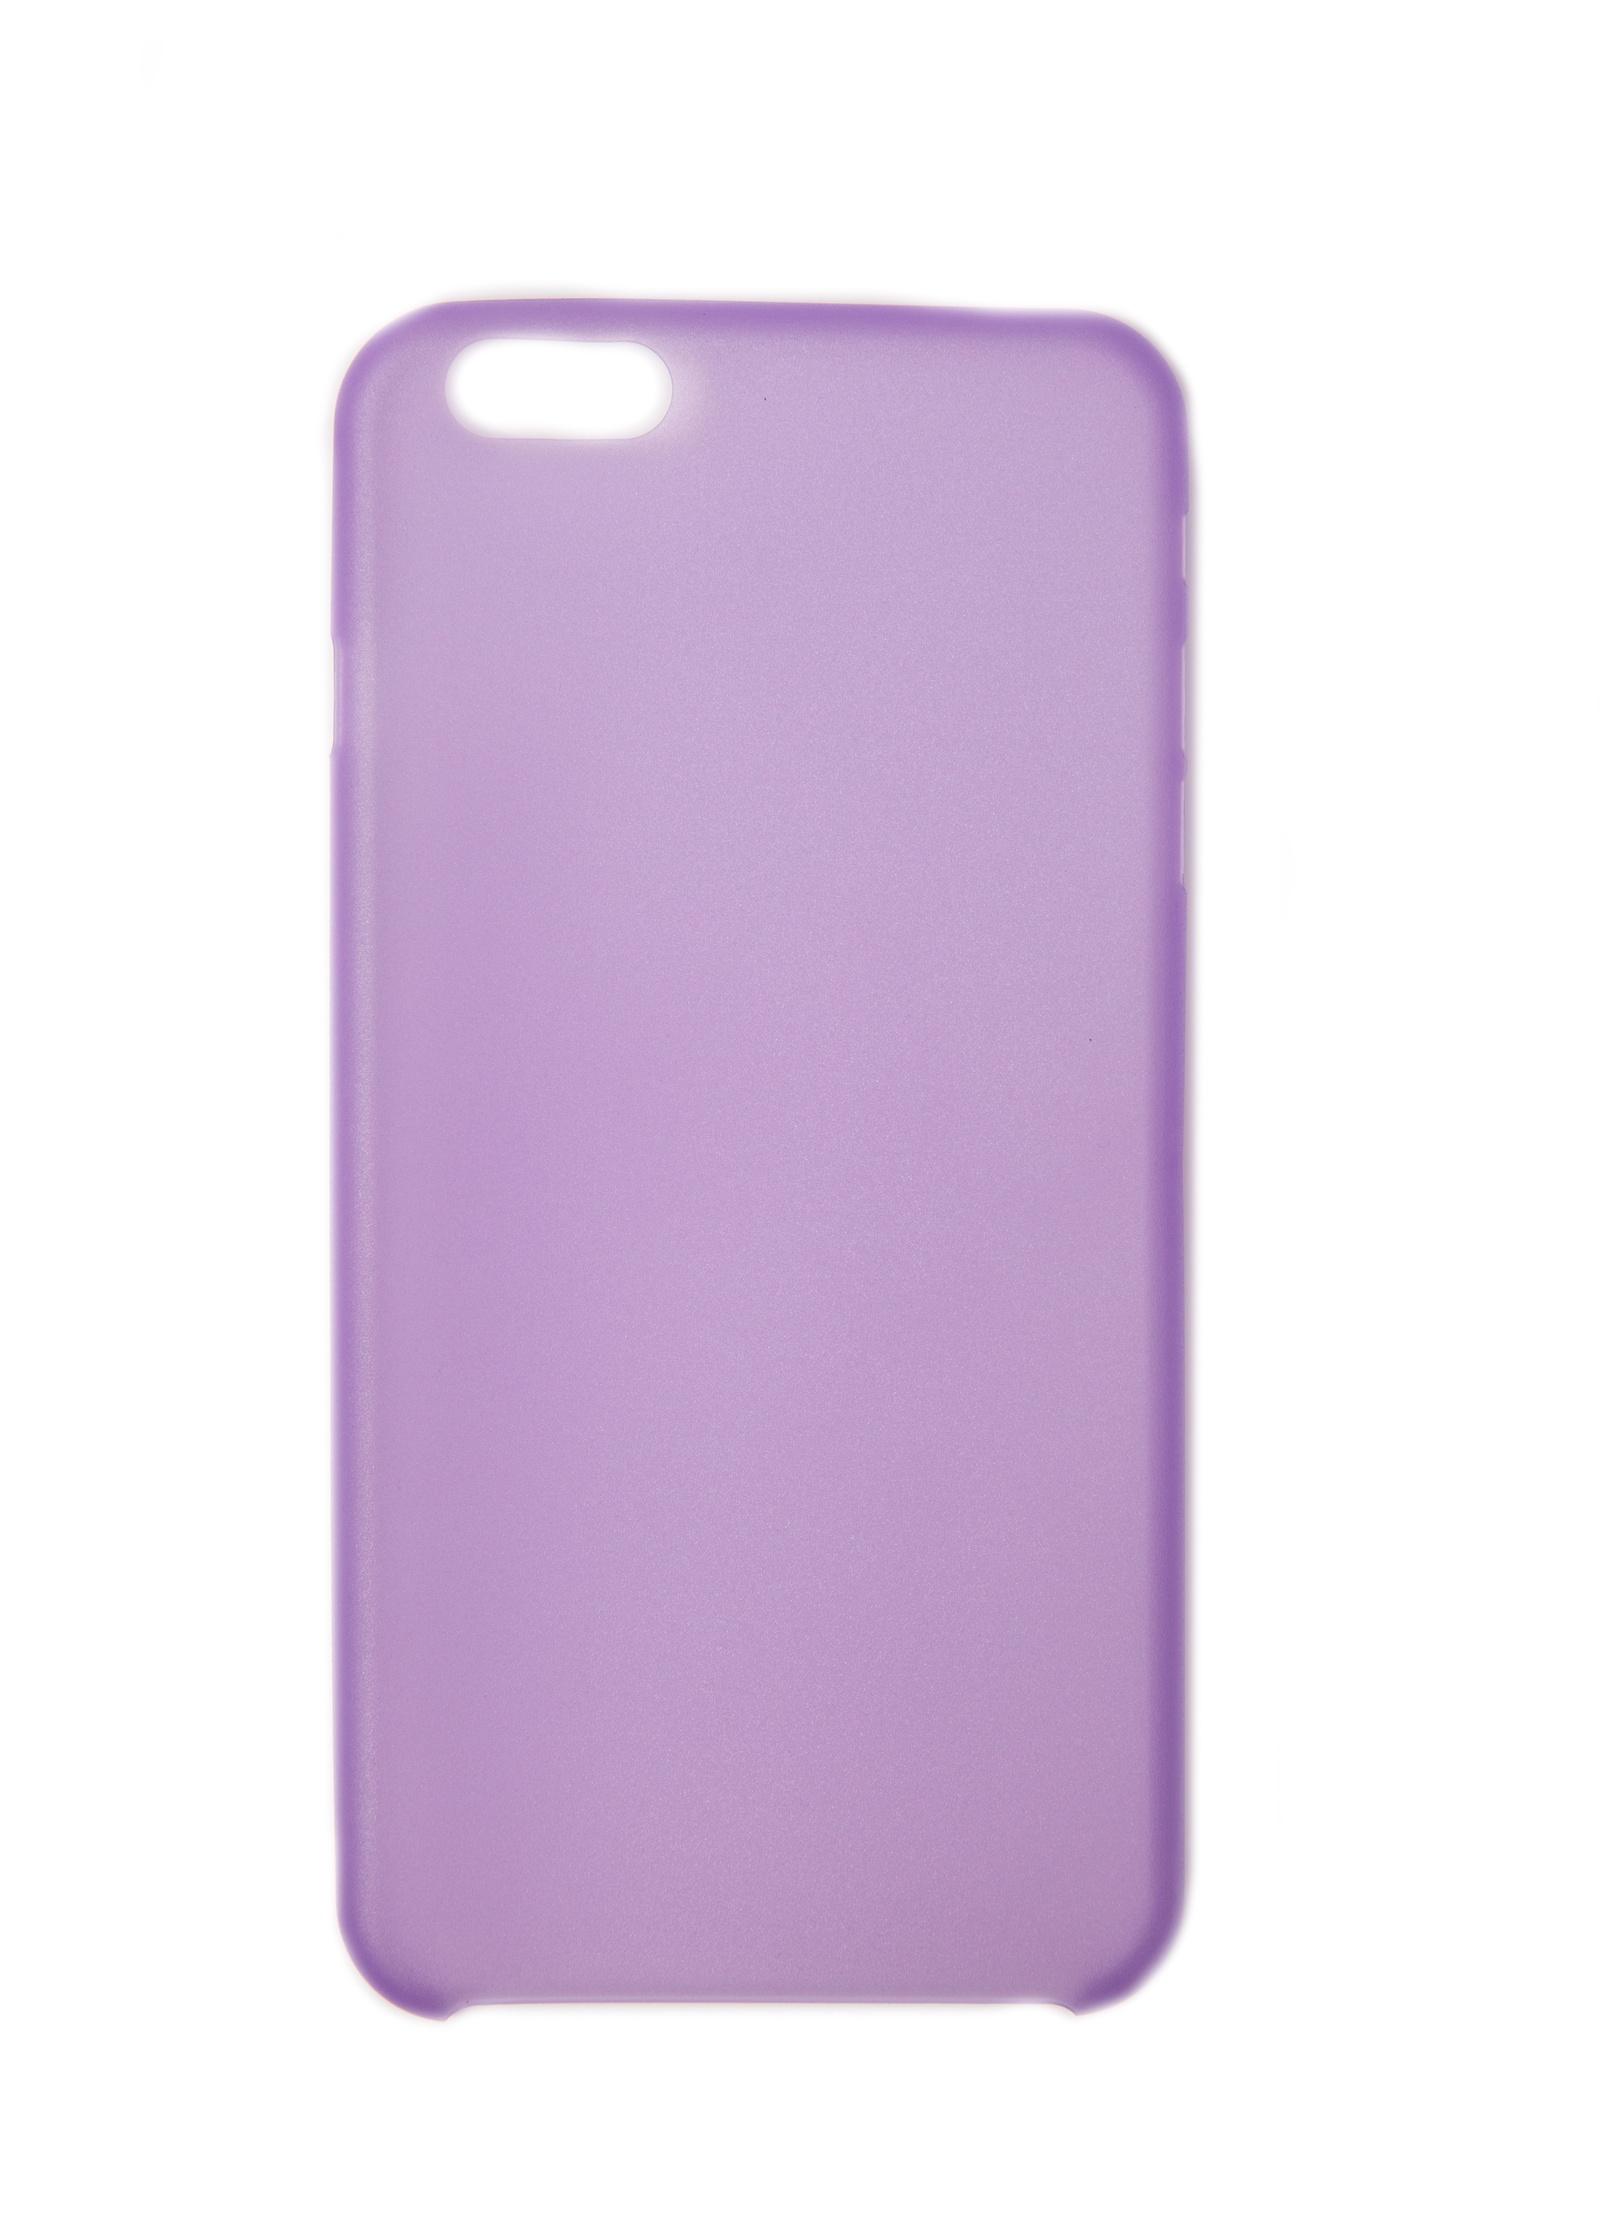 Чехол для сотового телефона Mitya Veselkov CASE, IP6.МITYA-232PVC все цены